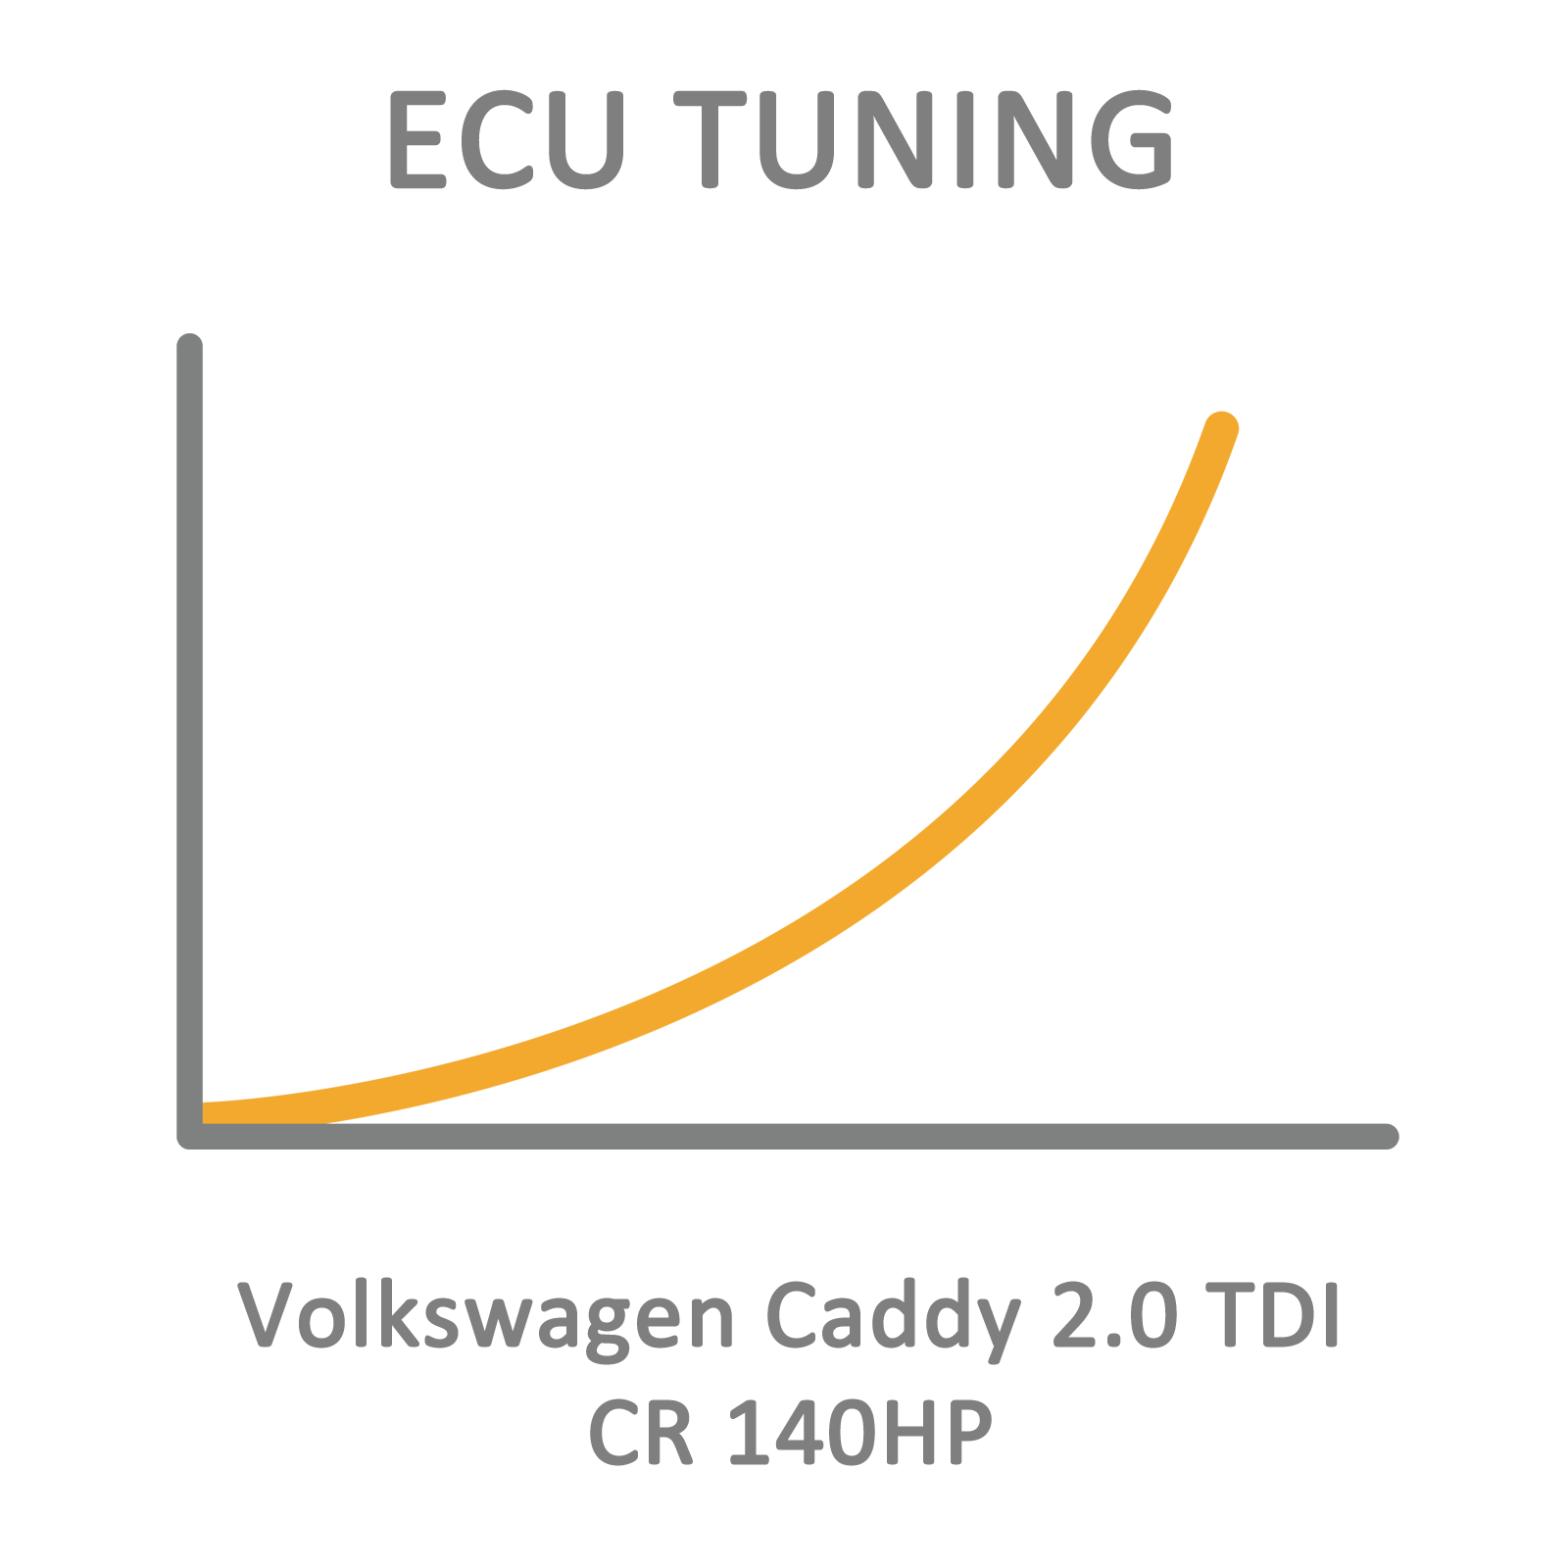 Volkswagen Caddy 2.0 TDI CR 140HP ECU Tuning Remapping